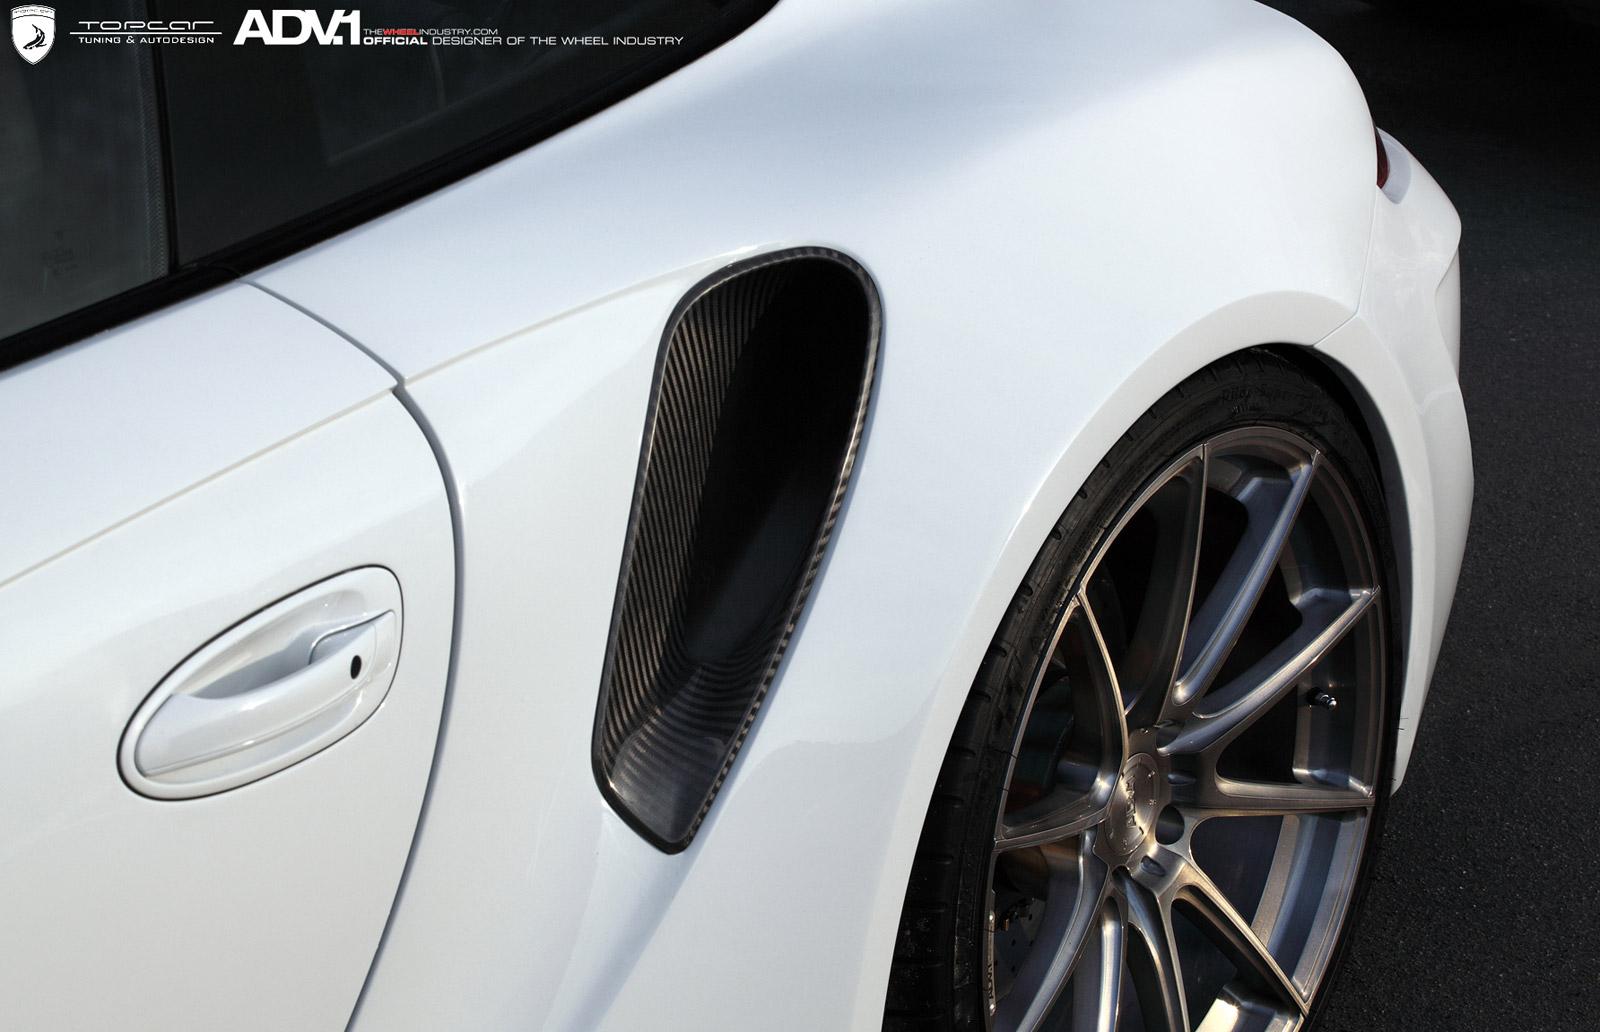 porsche-911-turbo-typ-991-topcar-stinger-gtr-003